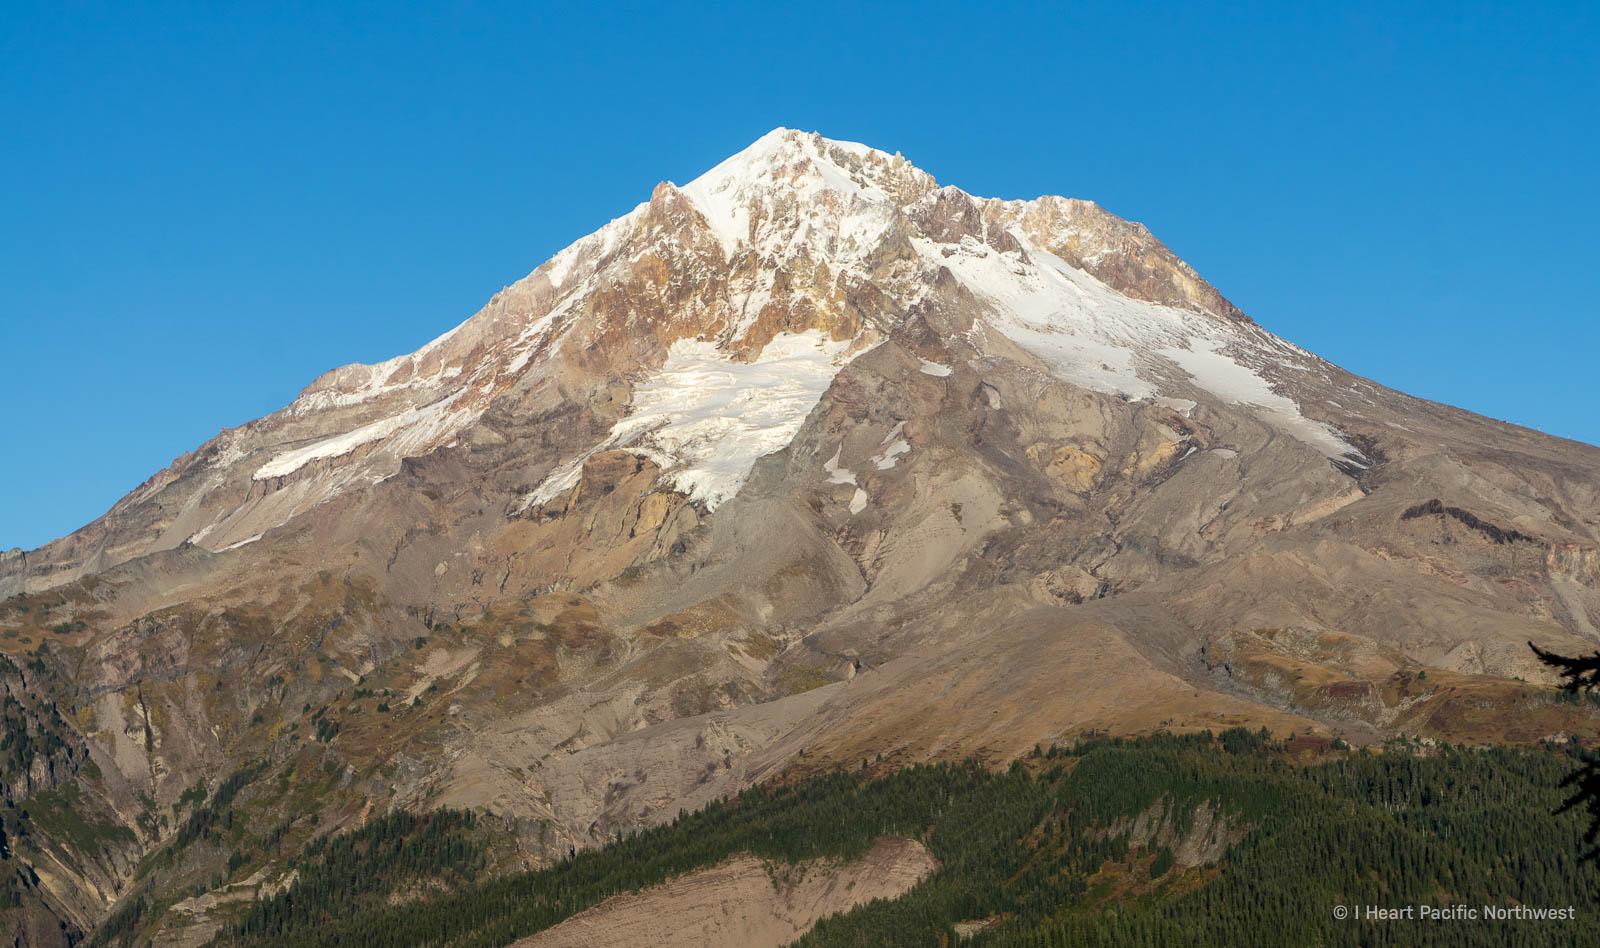 Mount Hood - Burnt Lake backpacking trip